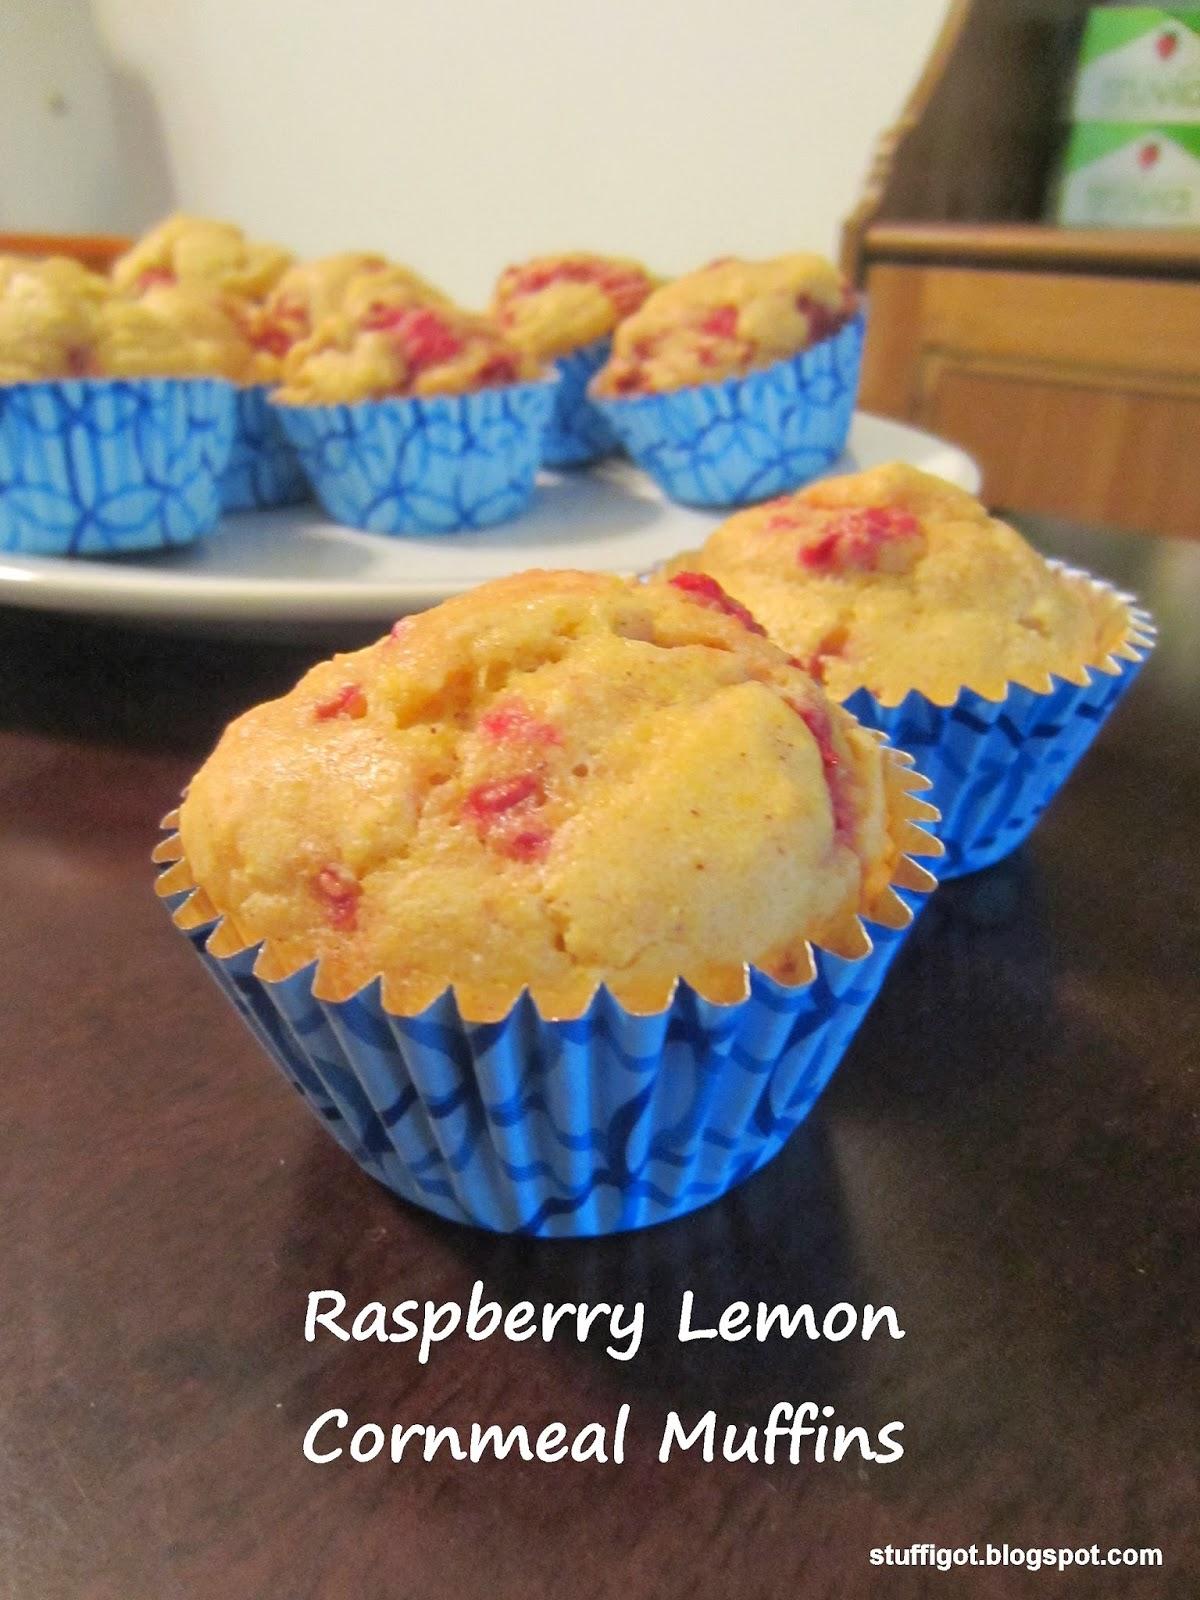 Raspberry Lemon Cornmeal Muffins